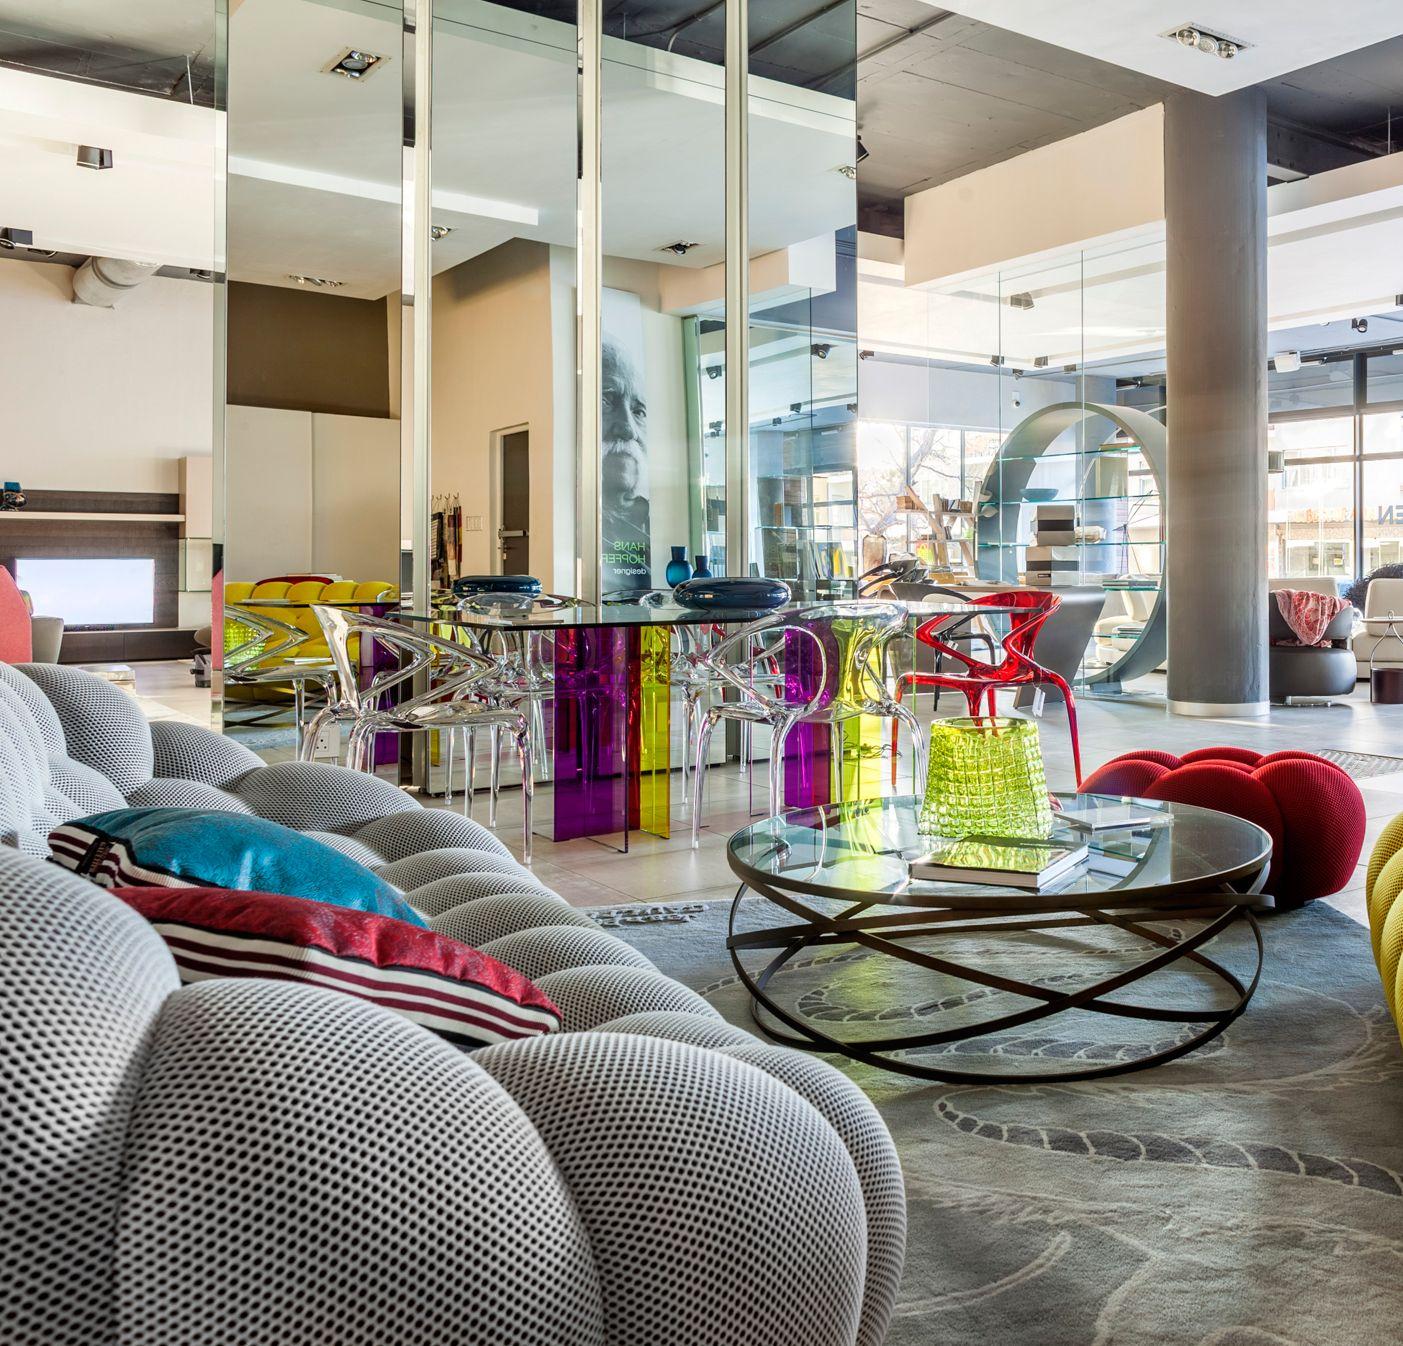 roche bobois showroom cape town 8001. Black Bedroom Furniture Sets. Home Design Ideas